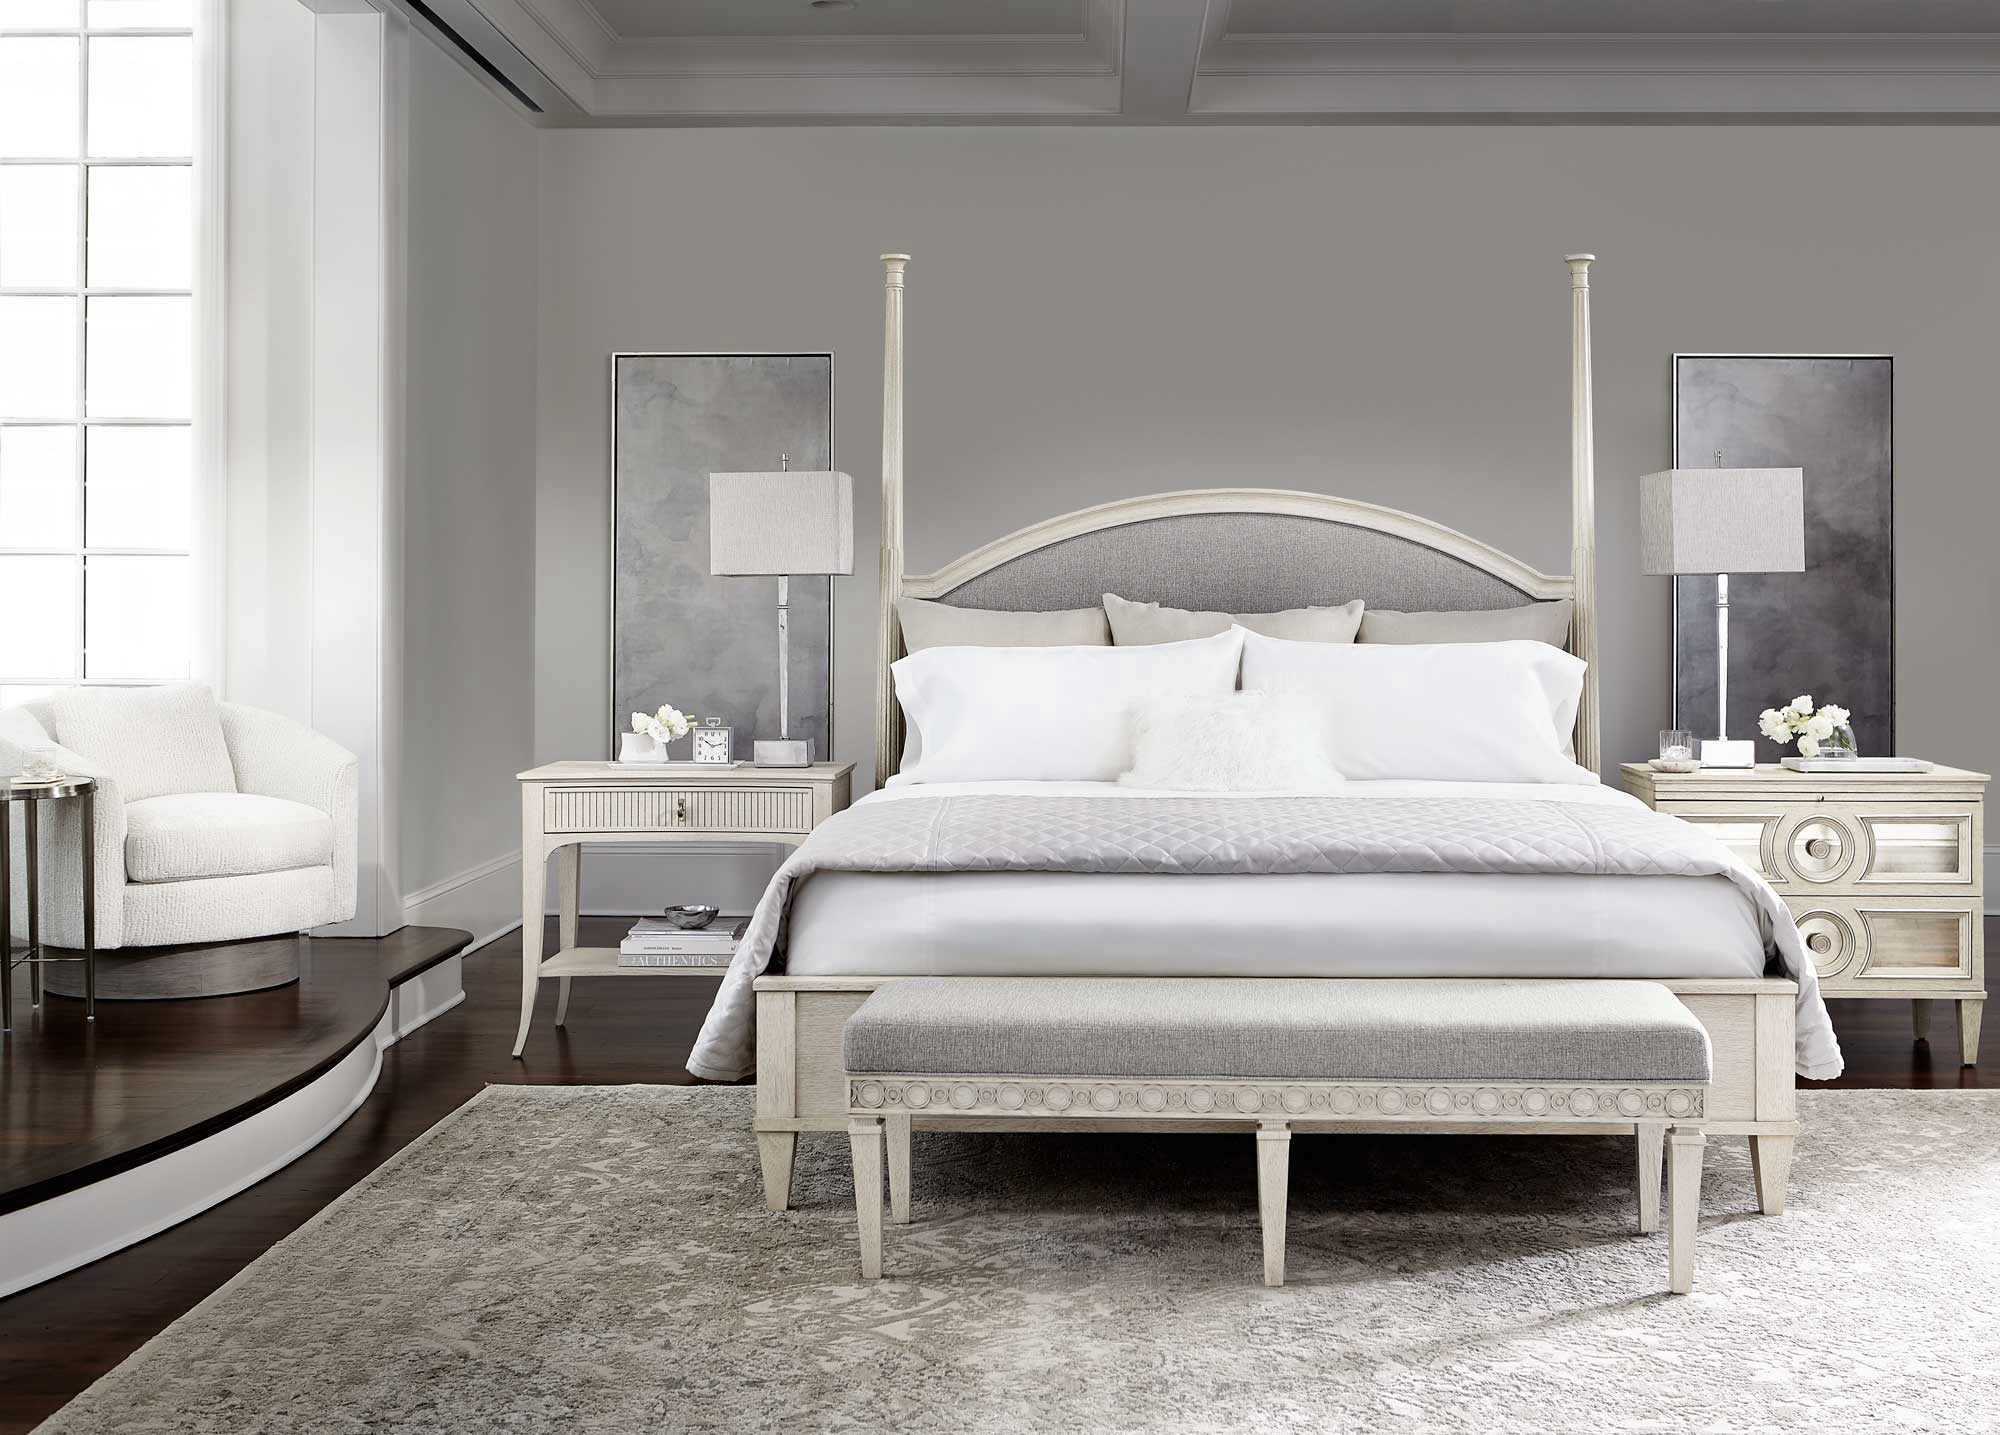 Design showcase image of bedroom.